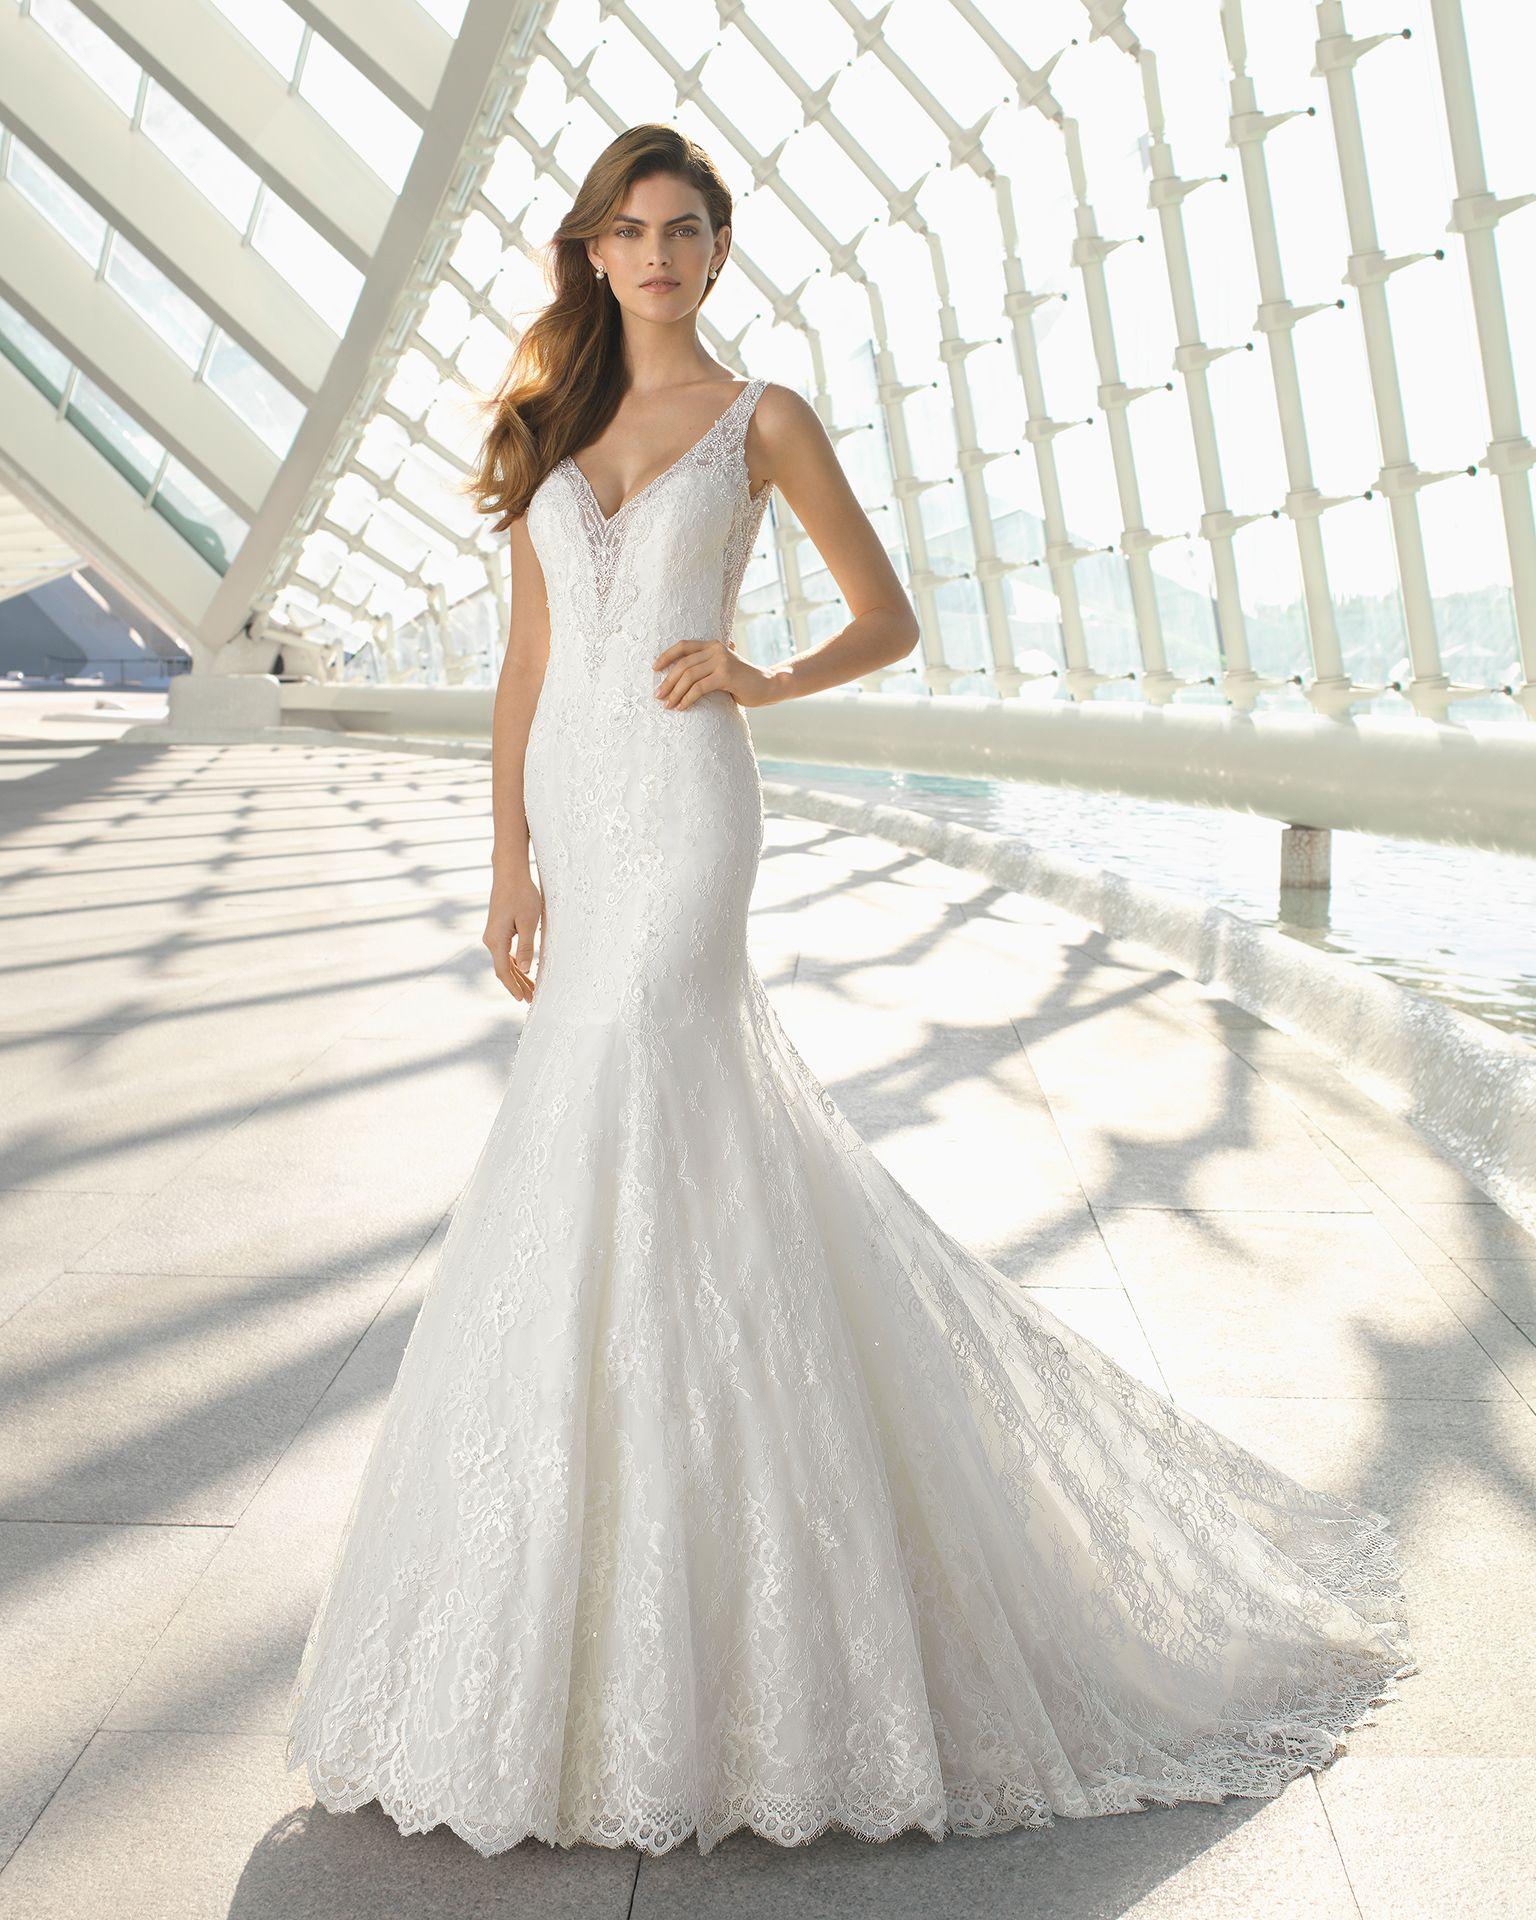 Vestidos de novia Rosa Clará 2019 ceñido con escote en V  vestidosdenovia   rosaclaranovias  rosaclara  modanupcial  weddingdresses  ropademujer  moda  ... 33af6f8d2b69